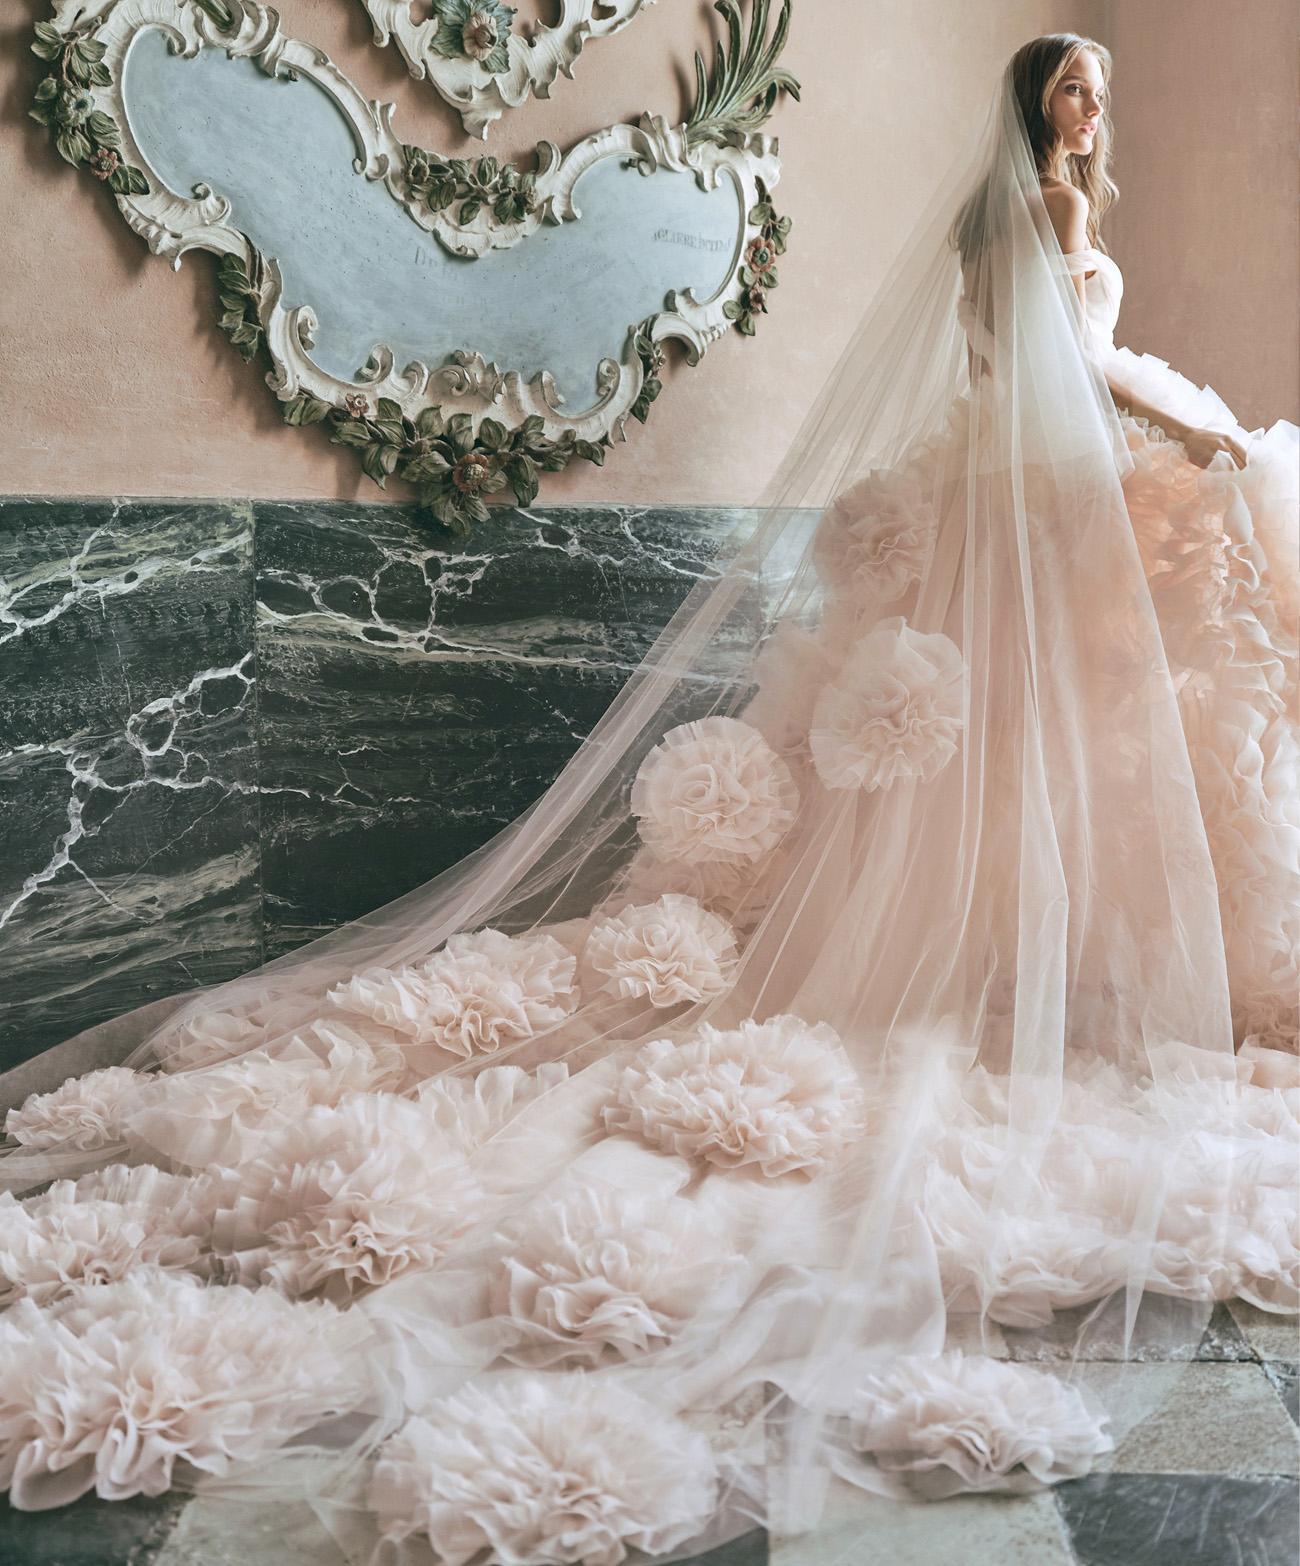 Monique Lhuillier Blush Wedding Gown